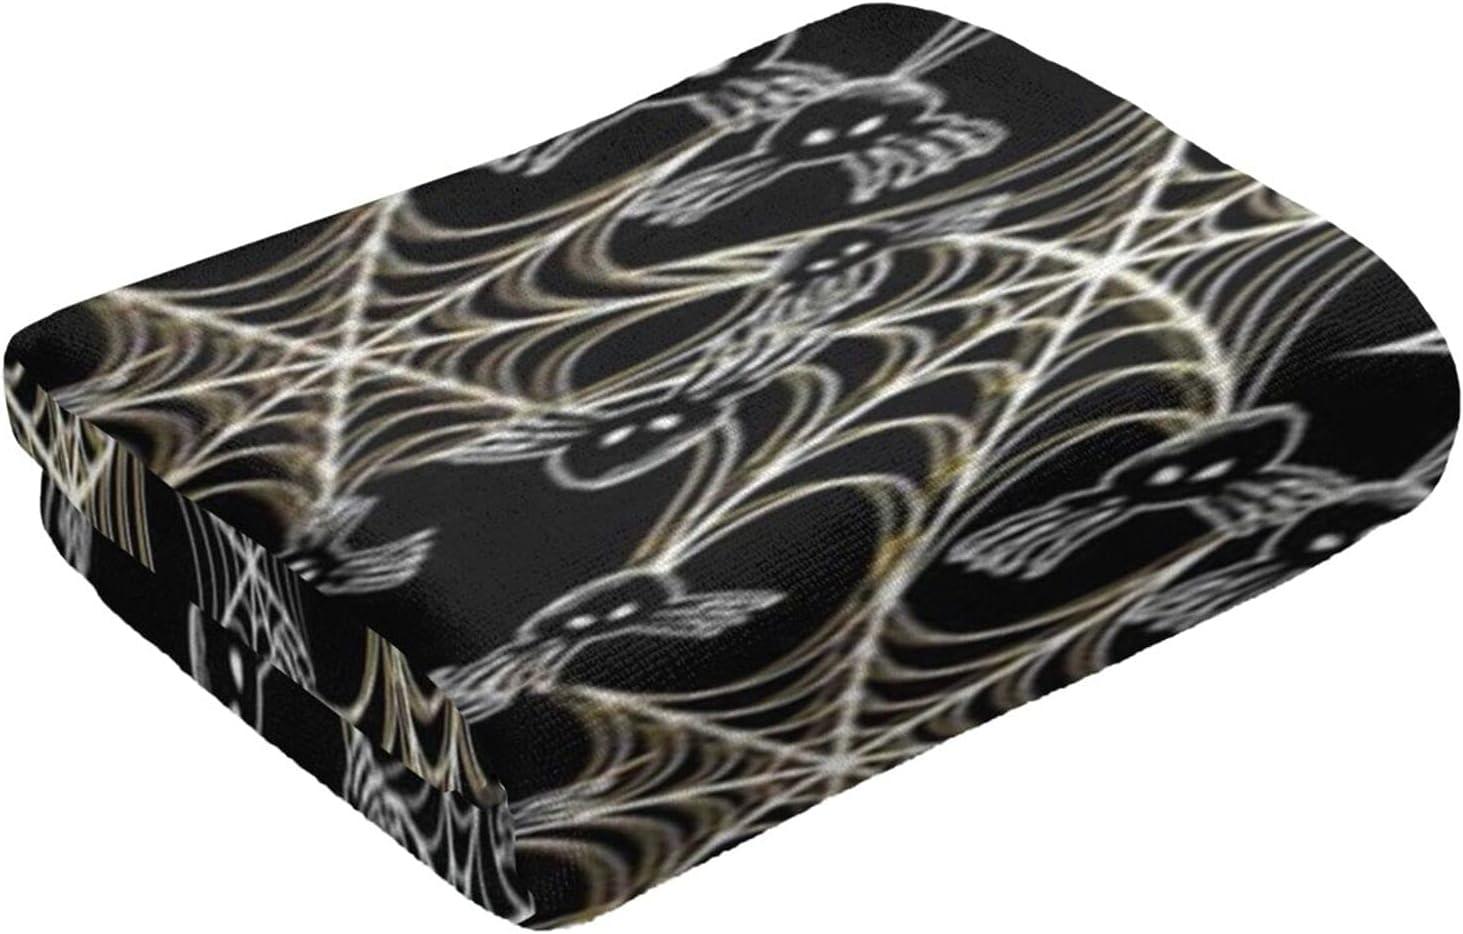 Towels shipfree Hand Washcloths 27.5x12 Fingert Detroit Mall Inch Polyester